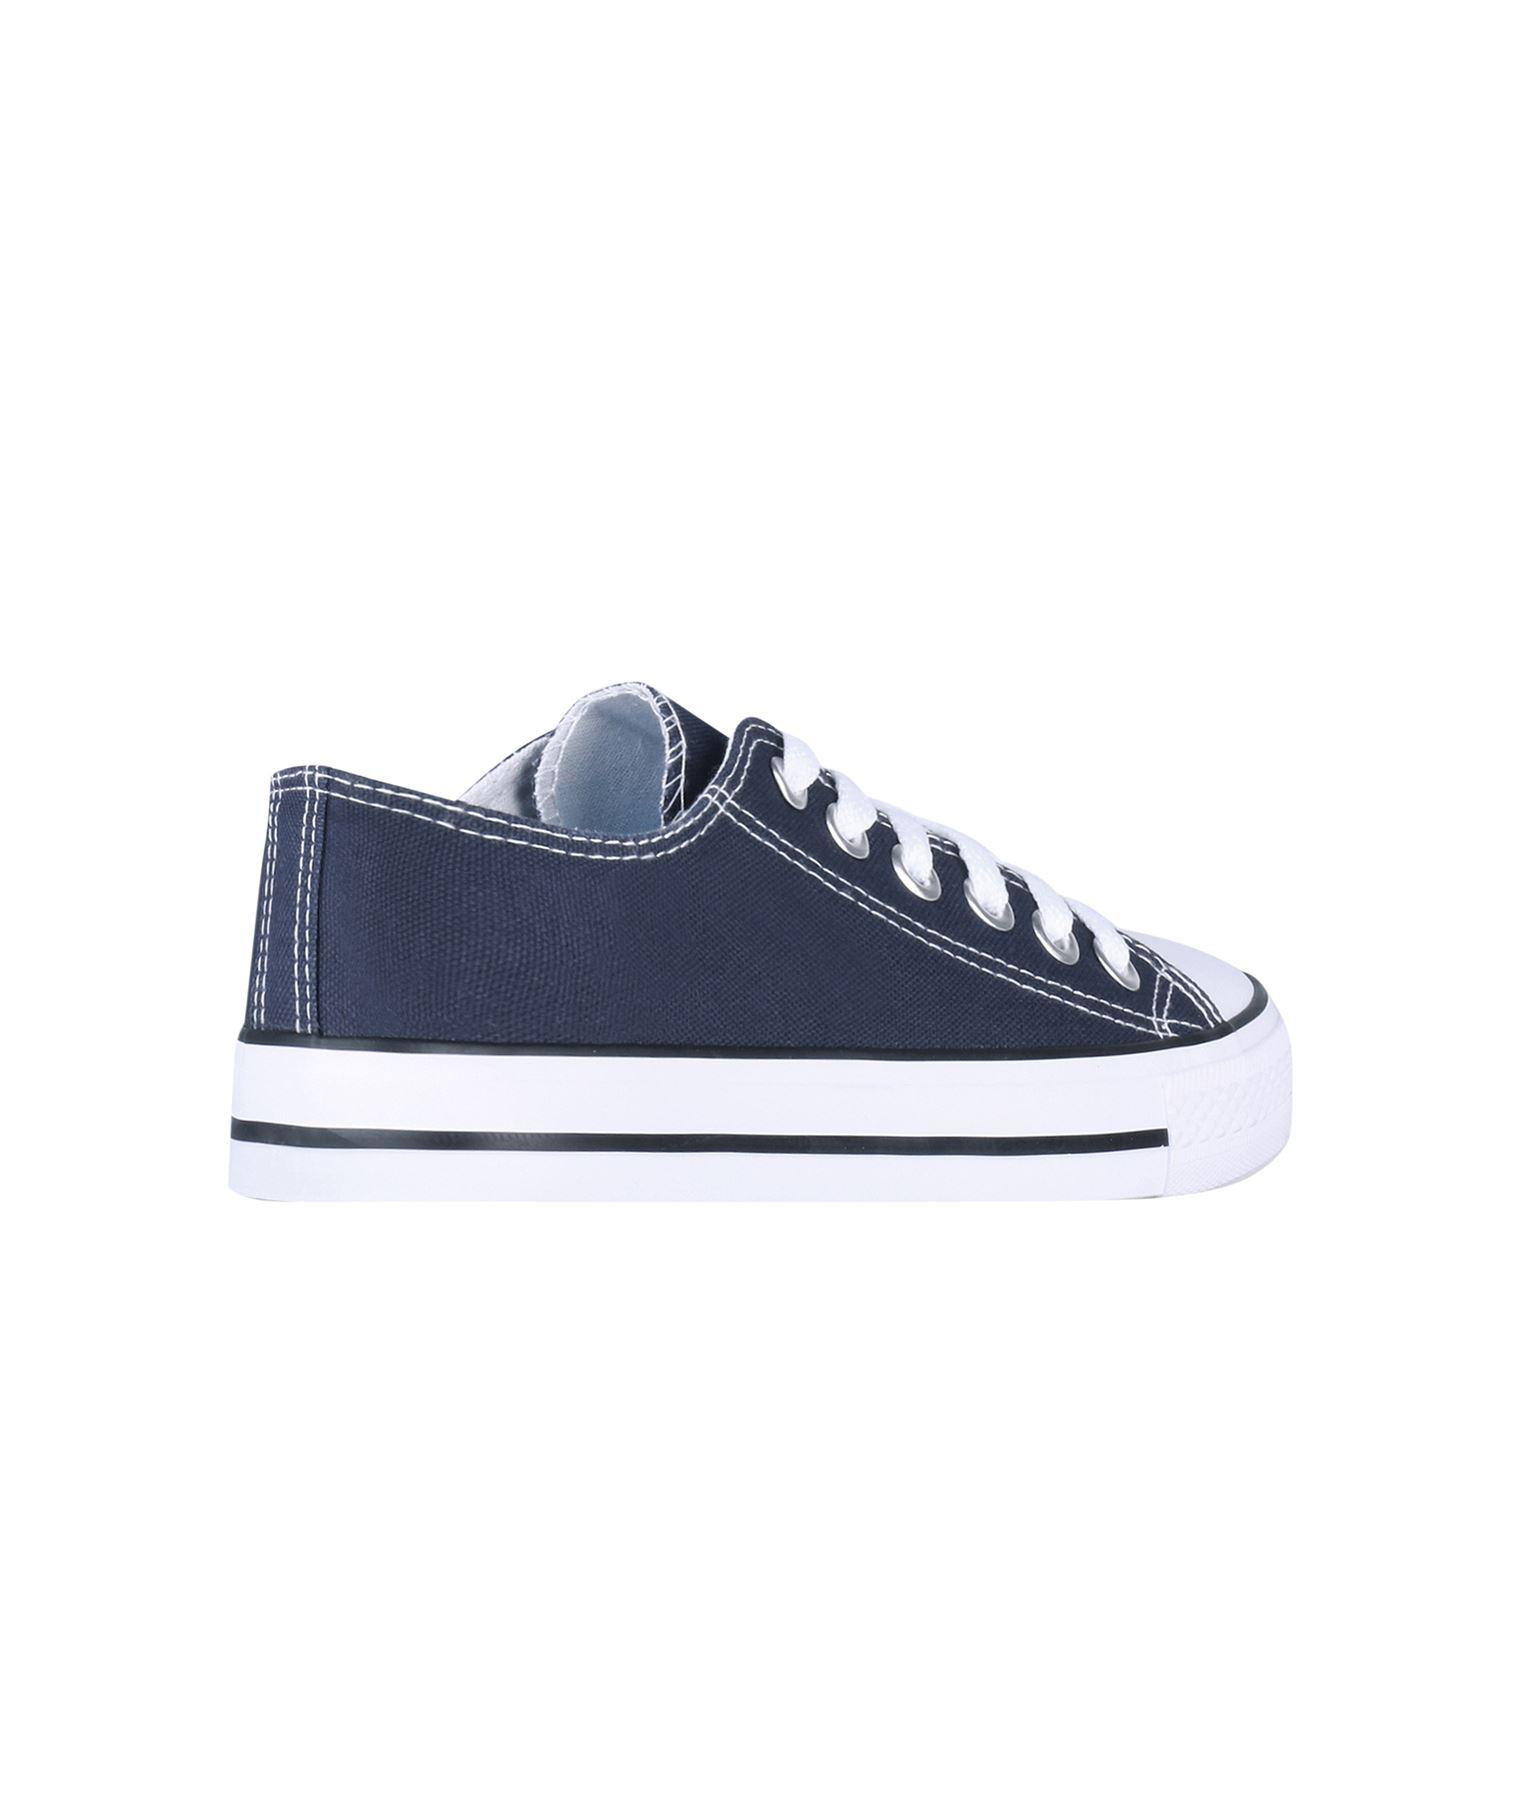 Zapatillas-Mujer-Casuales-Deportiva-Barata-Lona-Moda-Originales-Outlet-Tela-Moda miniatura 5